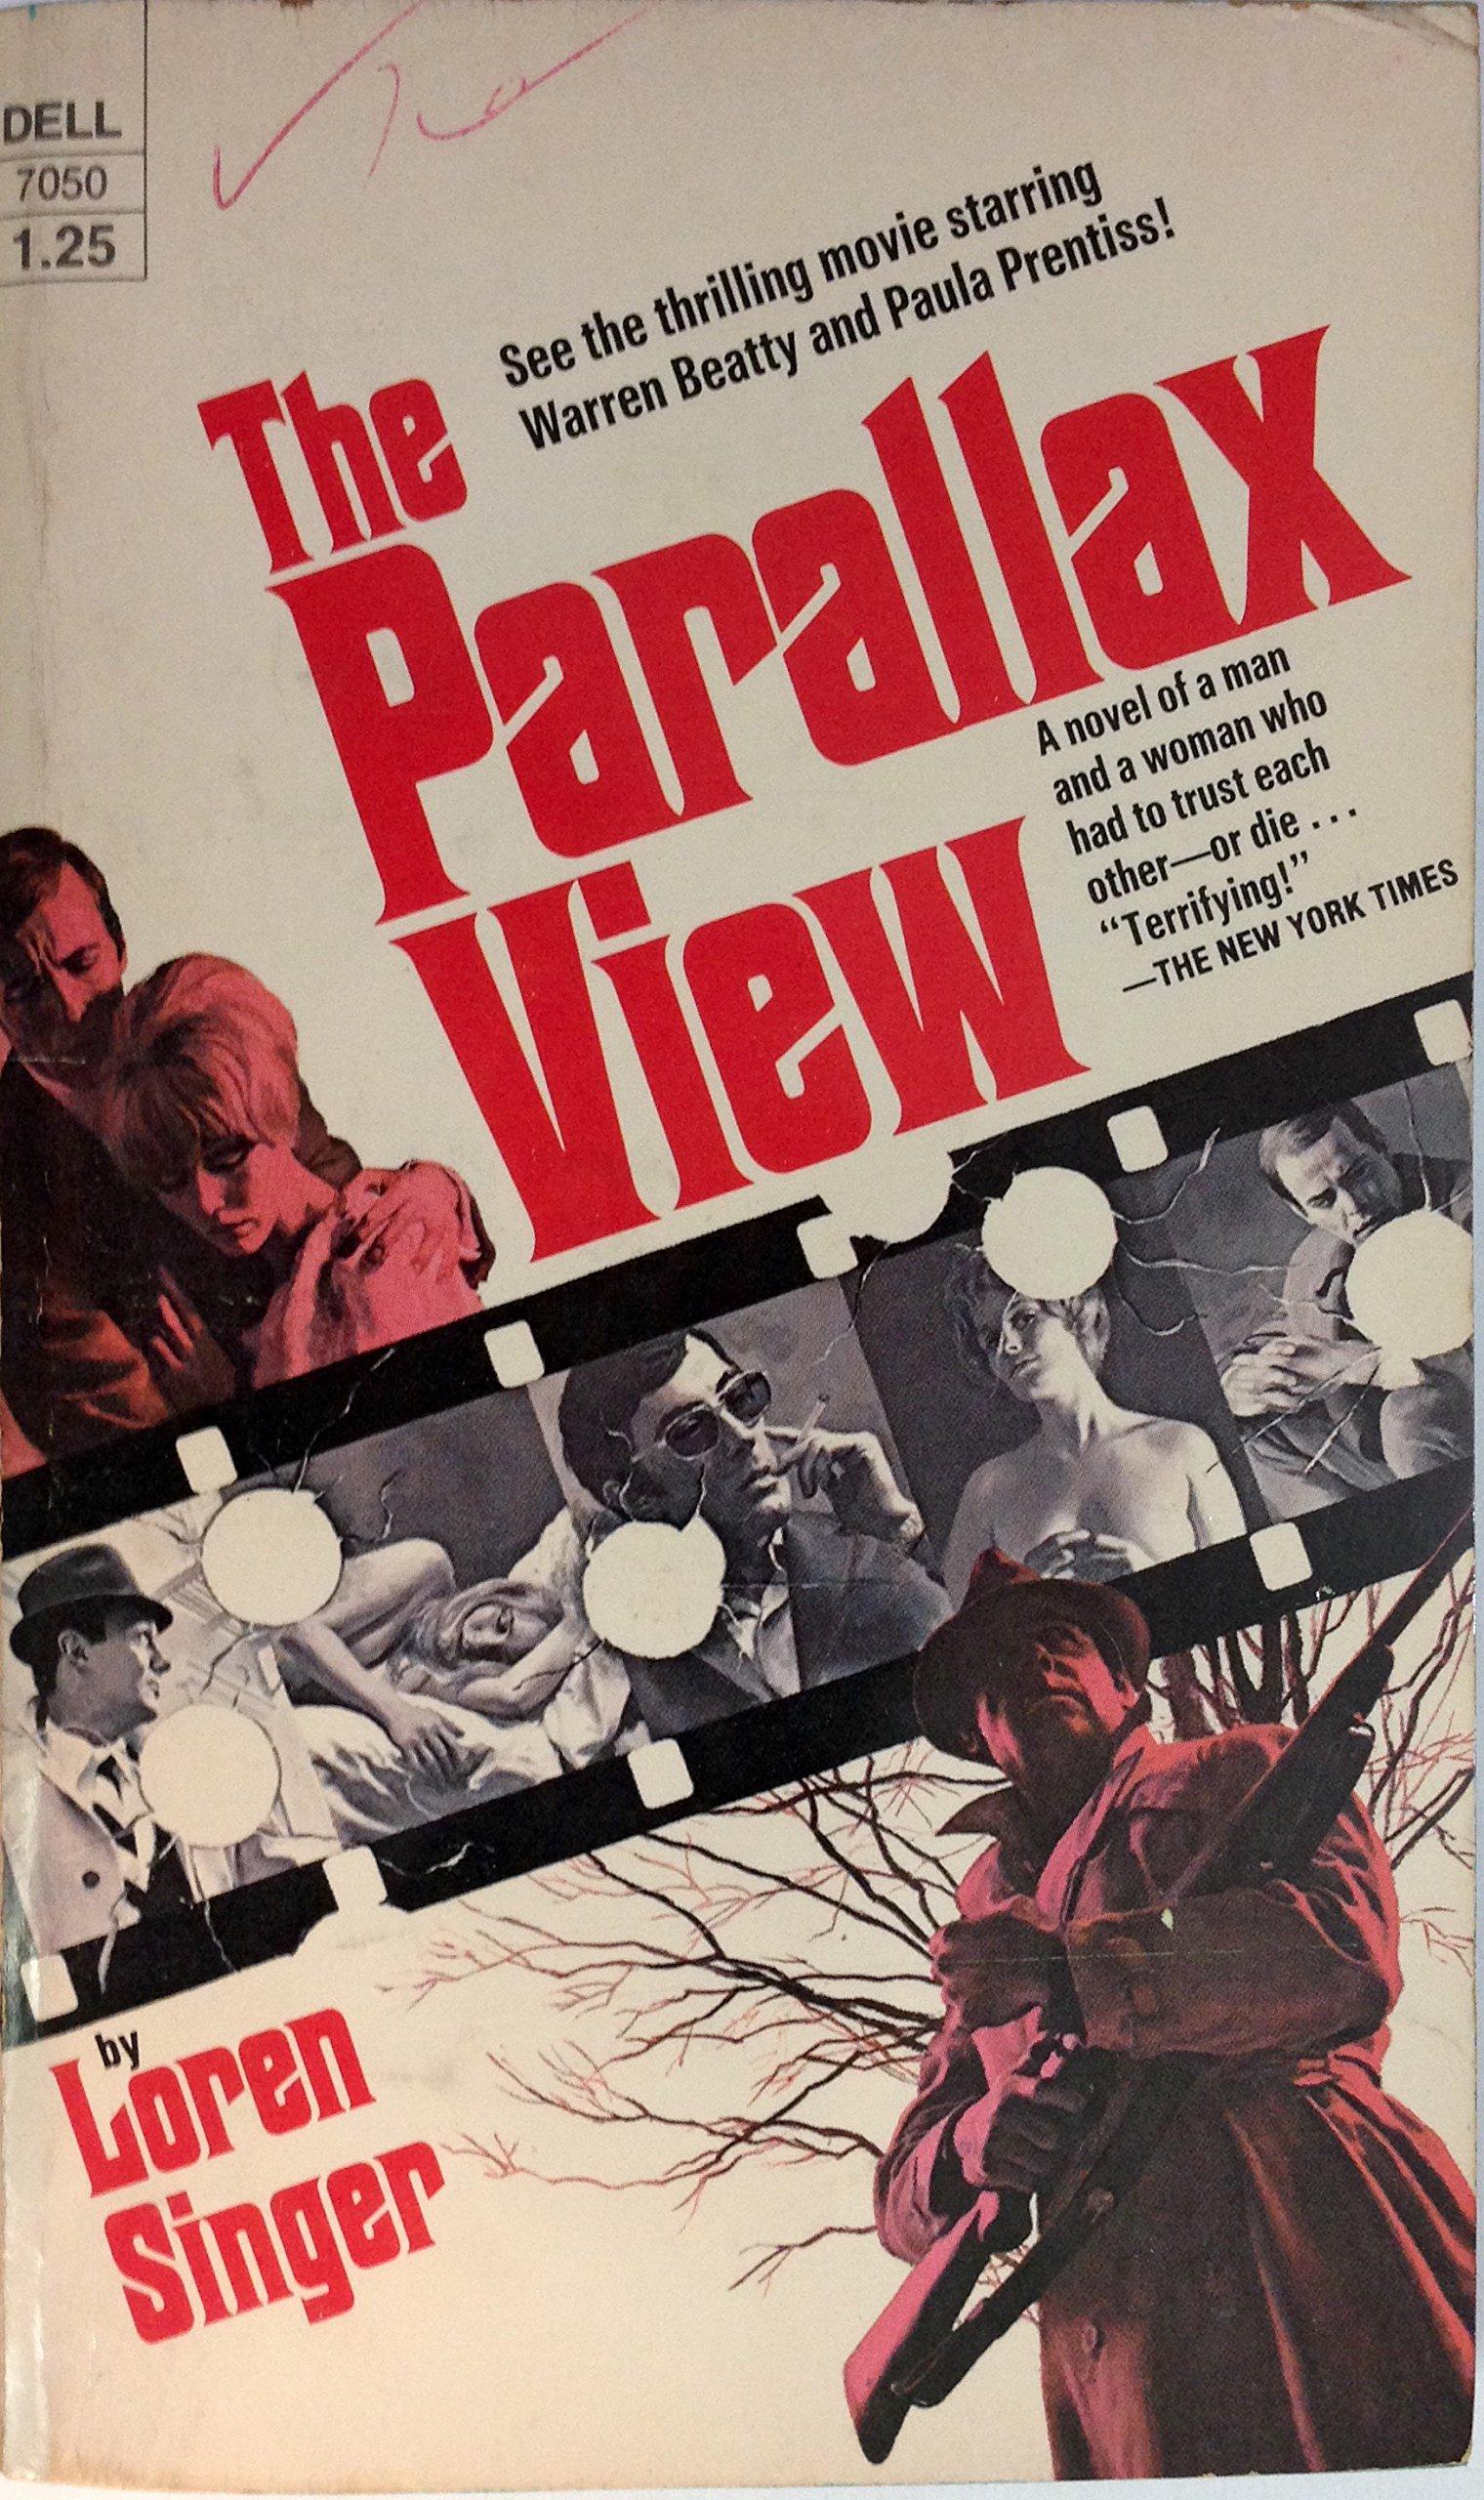 Parallax View Loren Singer product image